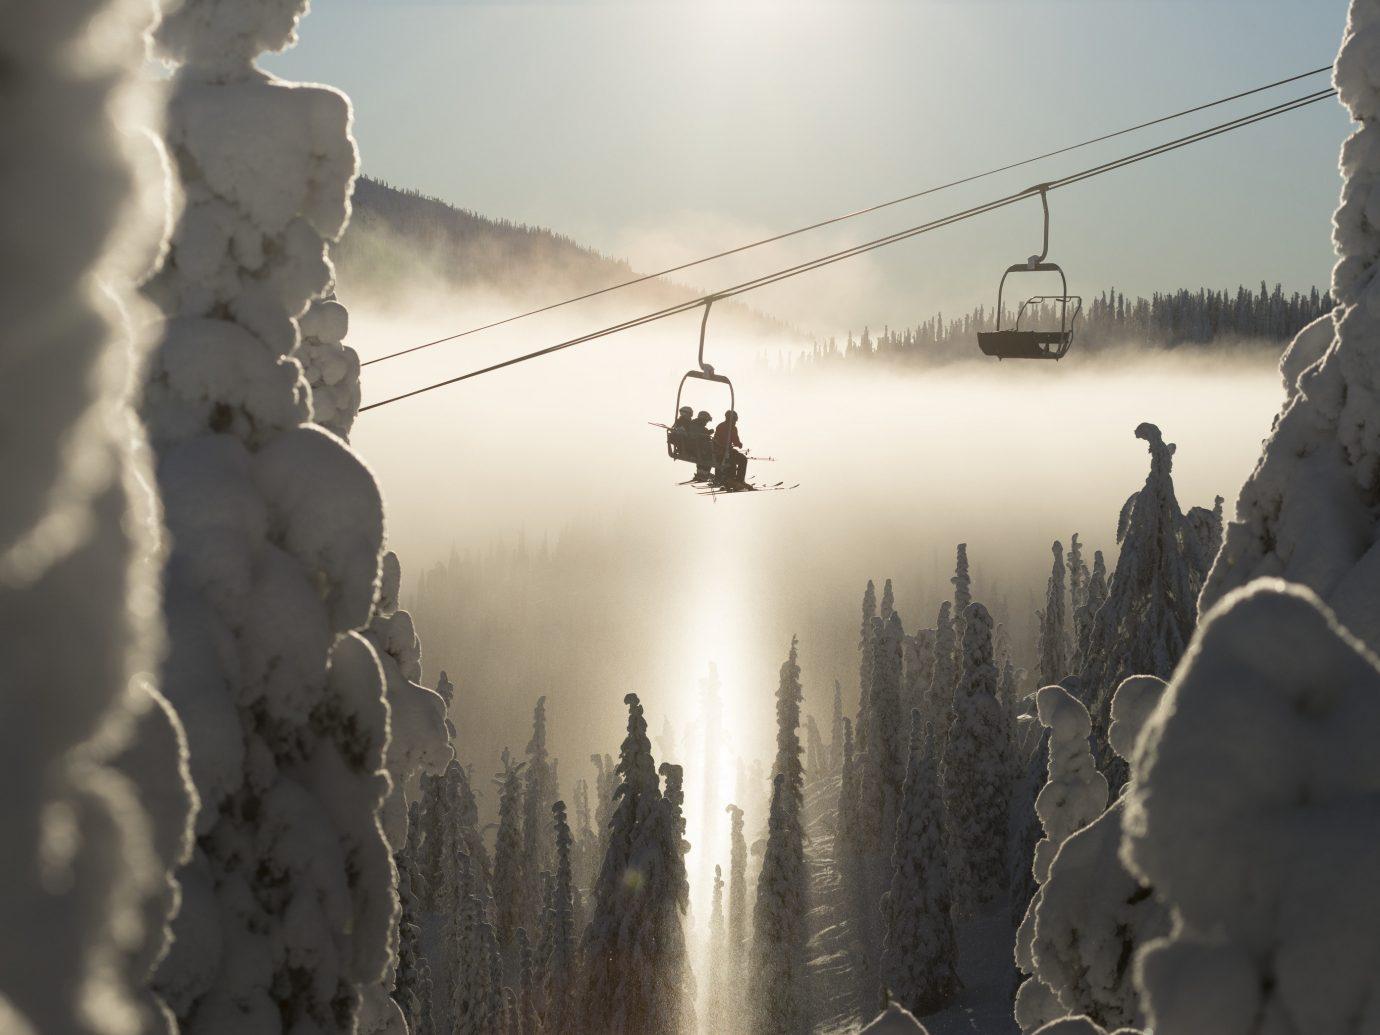 Ski lift at Red Mountain